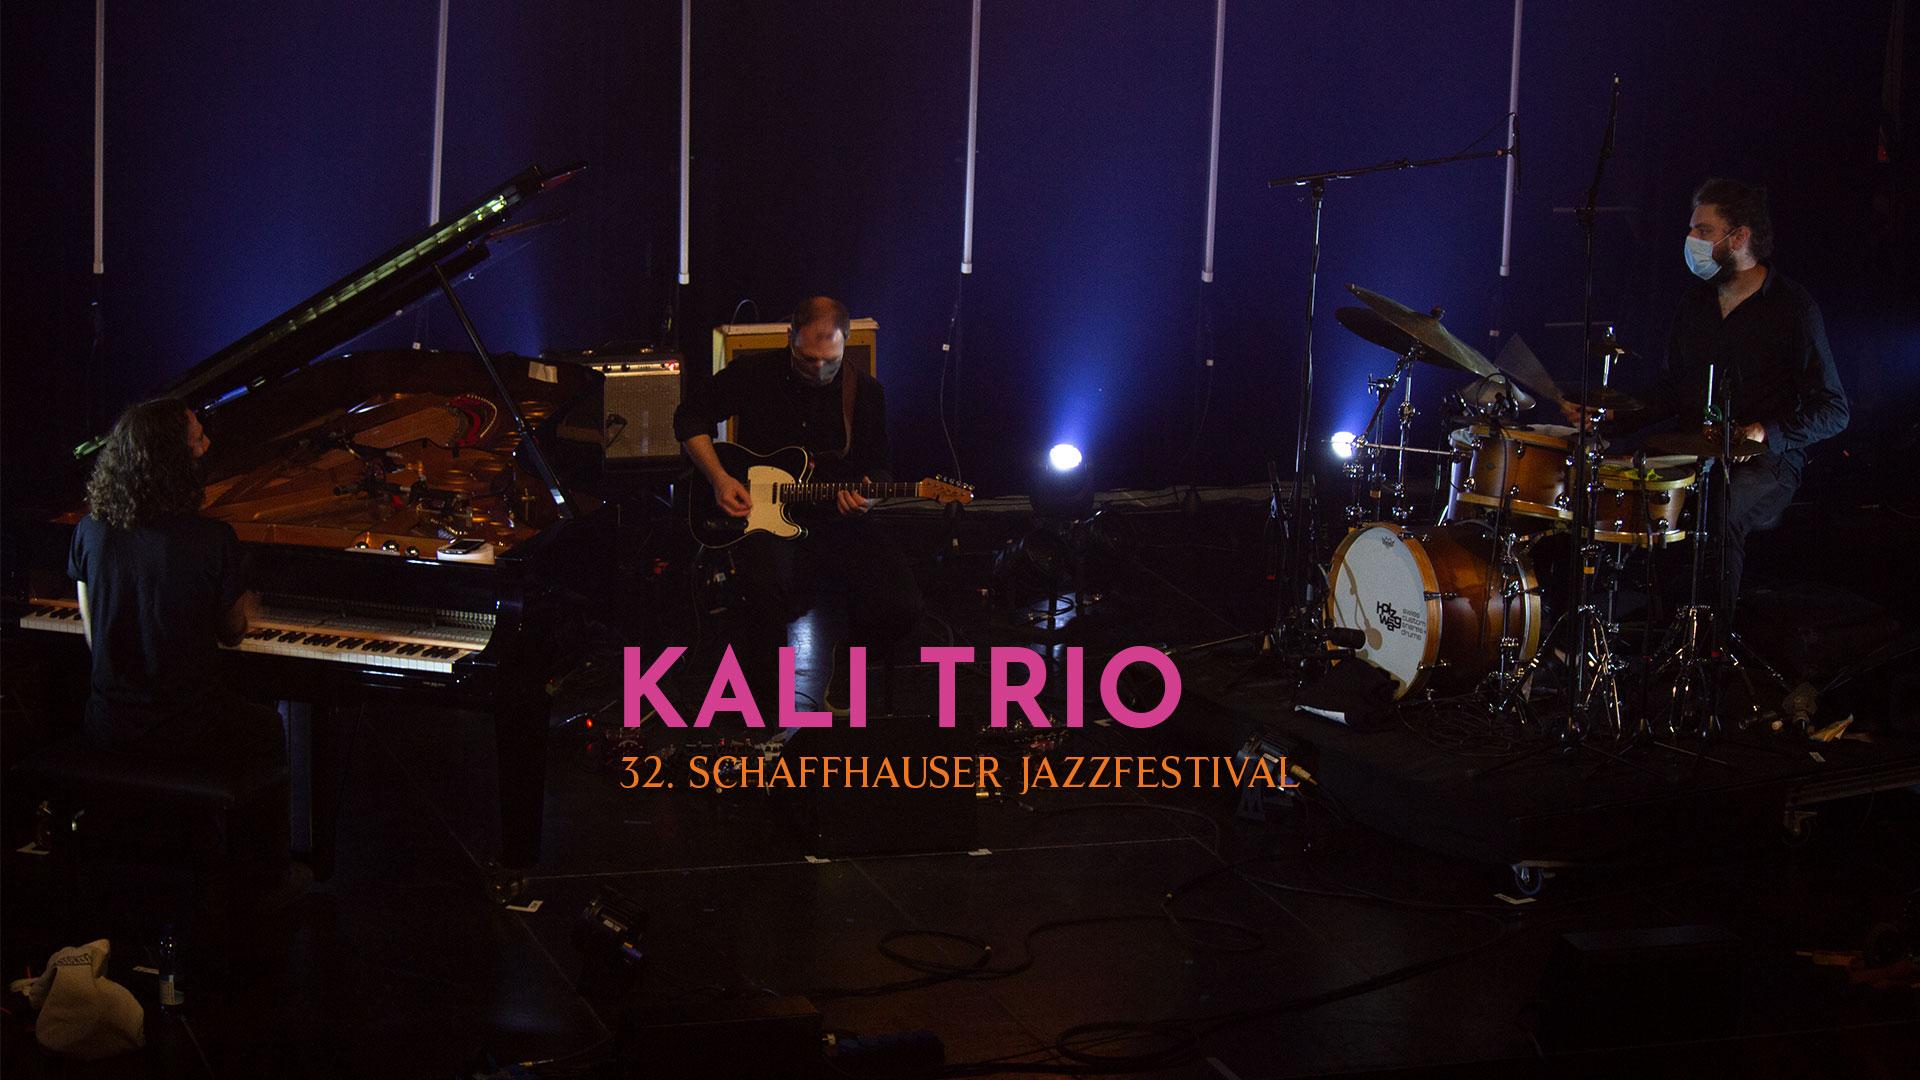 Kali Trio